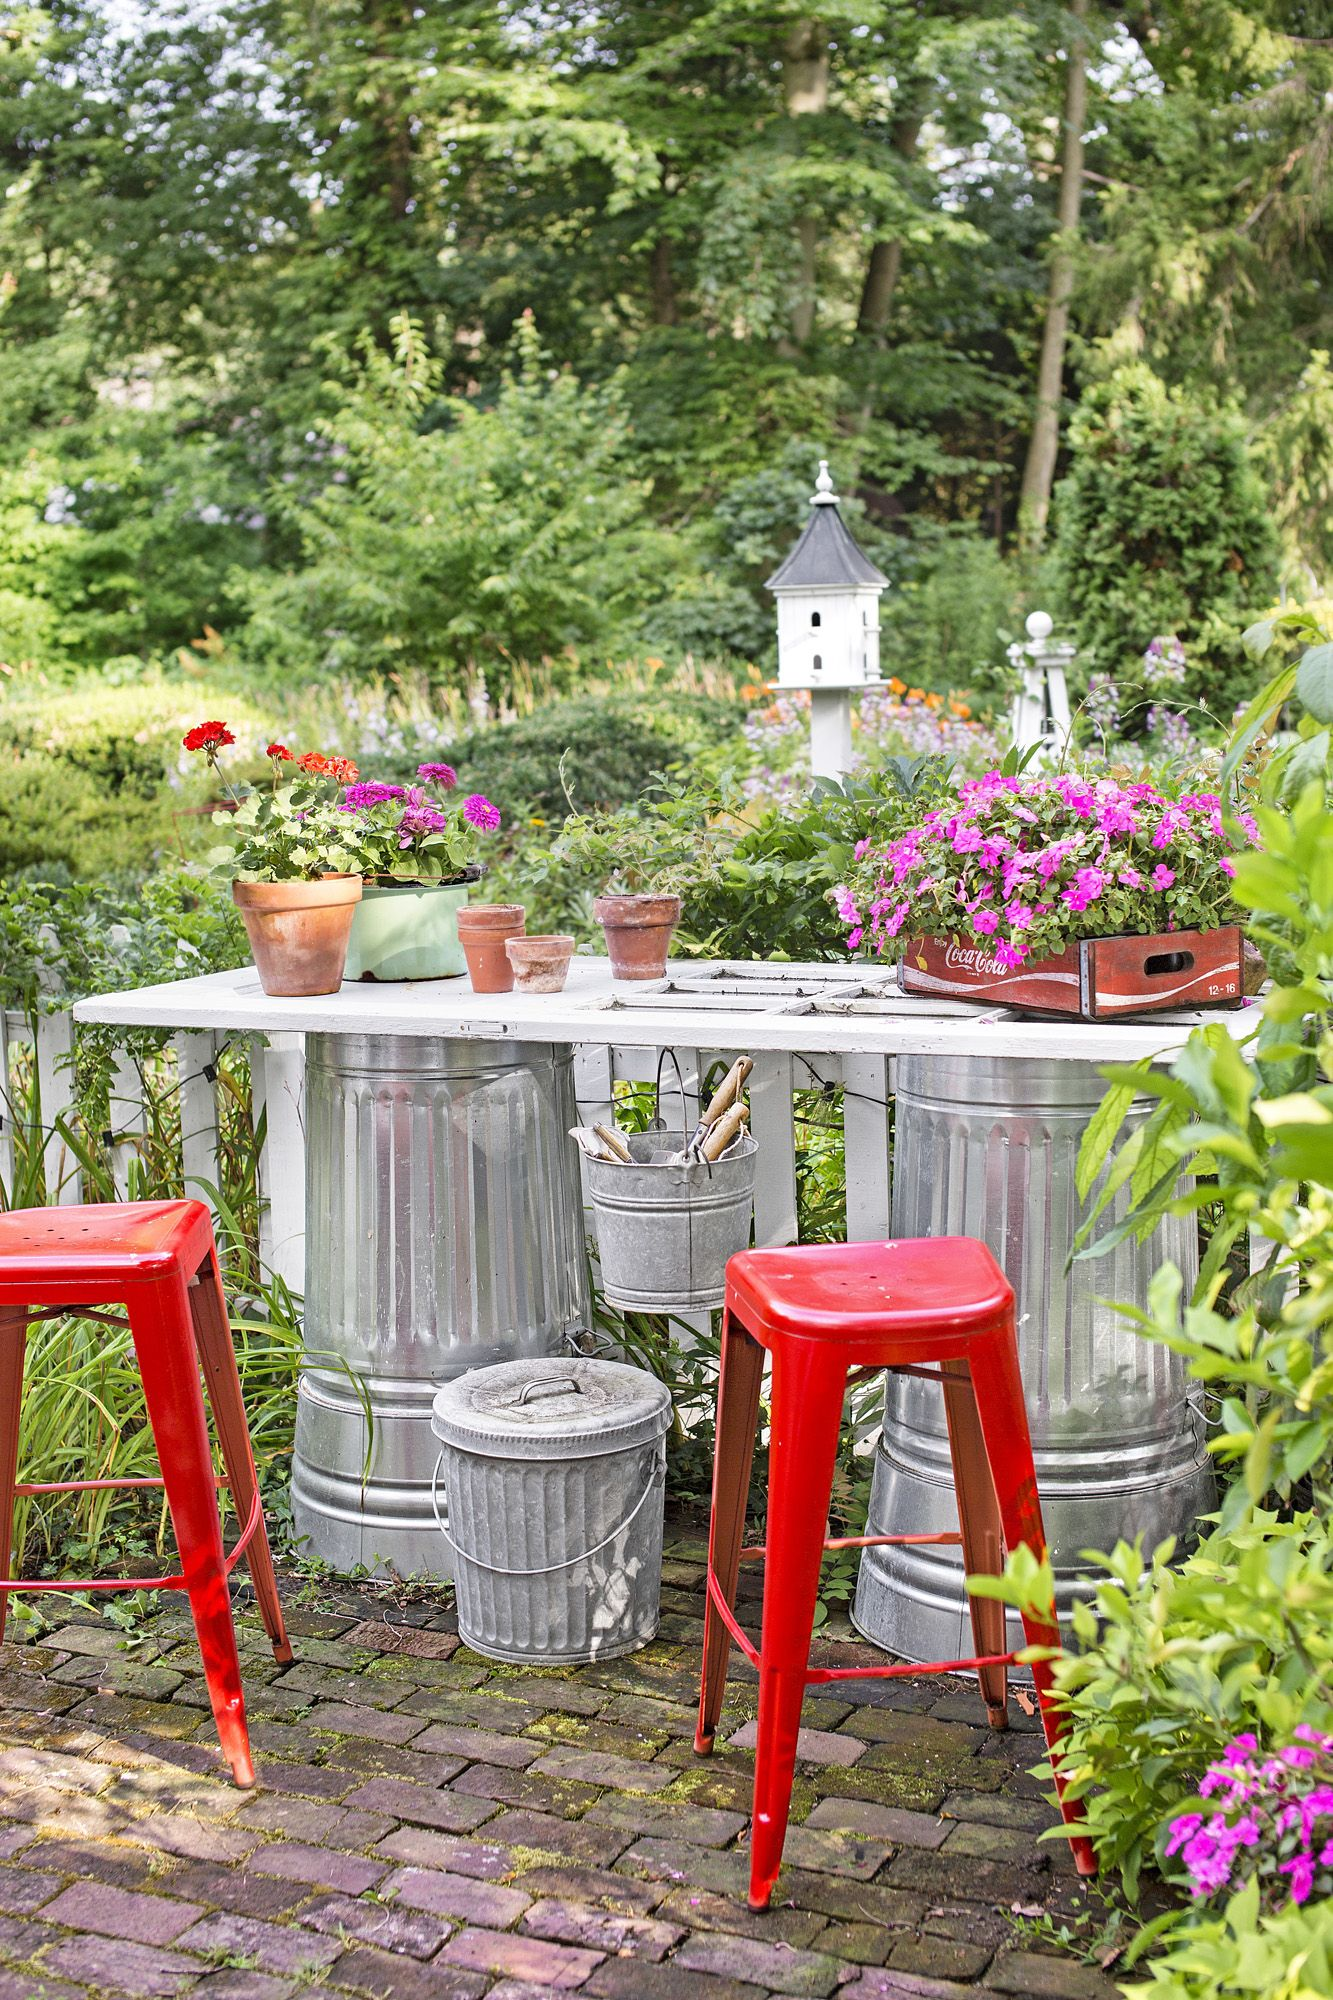 85 Best Backyard Ideas - Easy DIY Backyard Design Tips on Diy Back Garden Ideas  id=90288